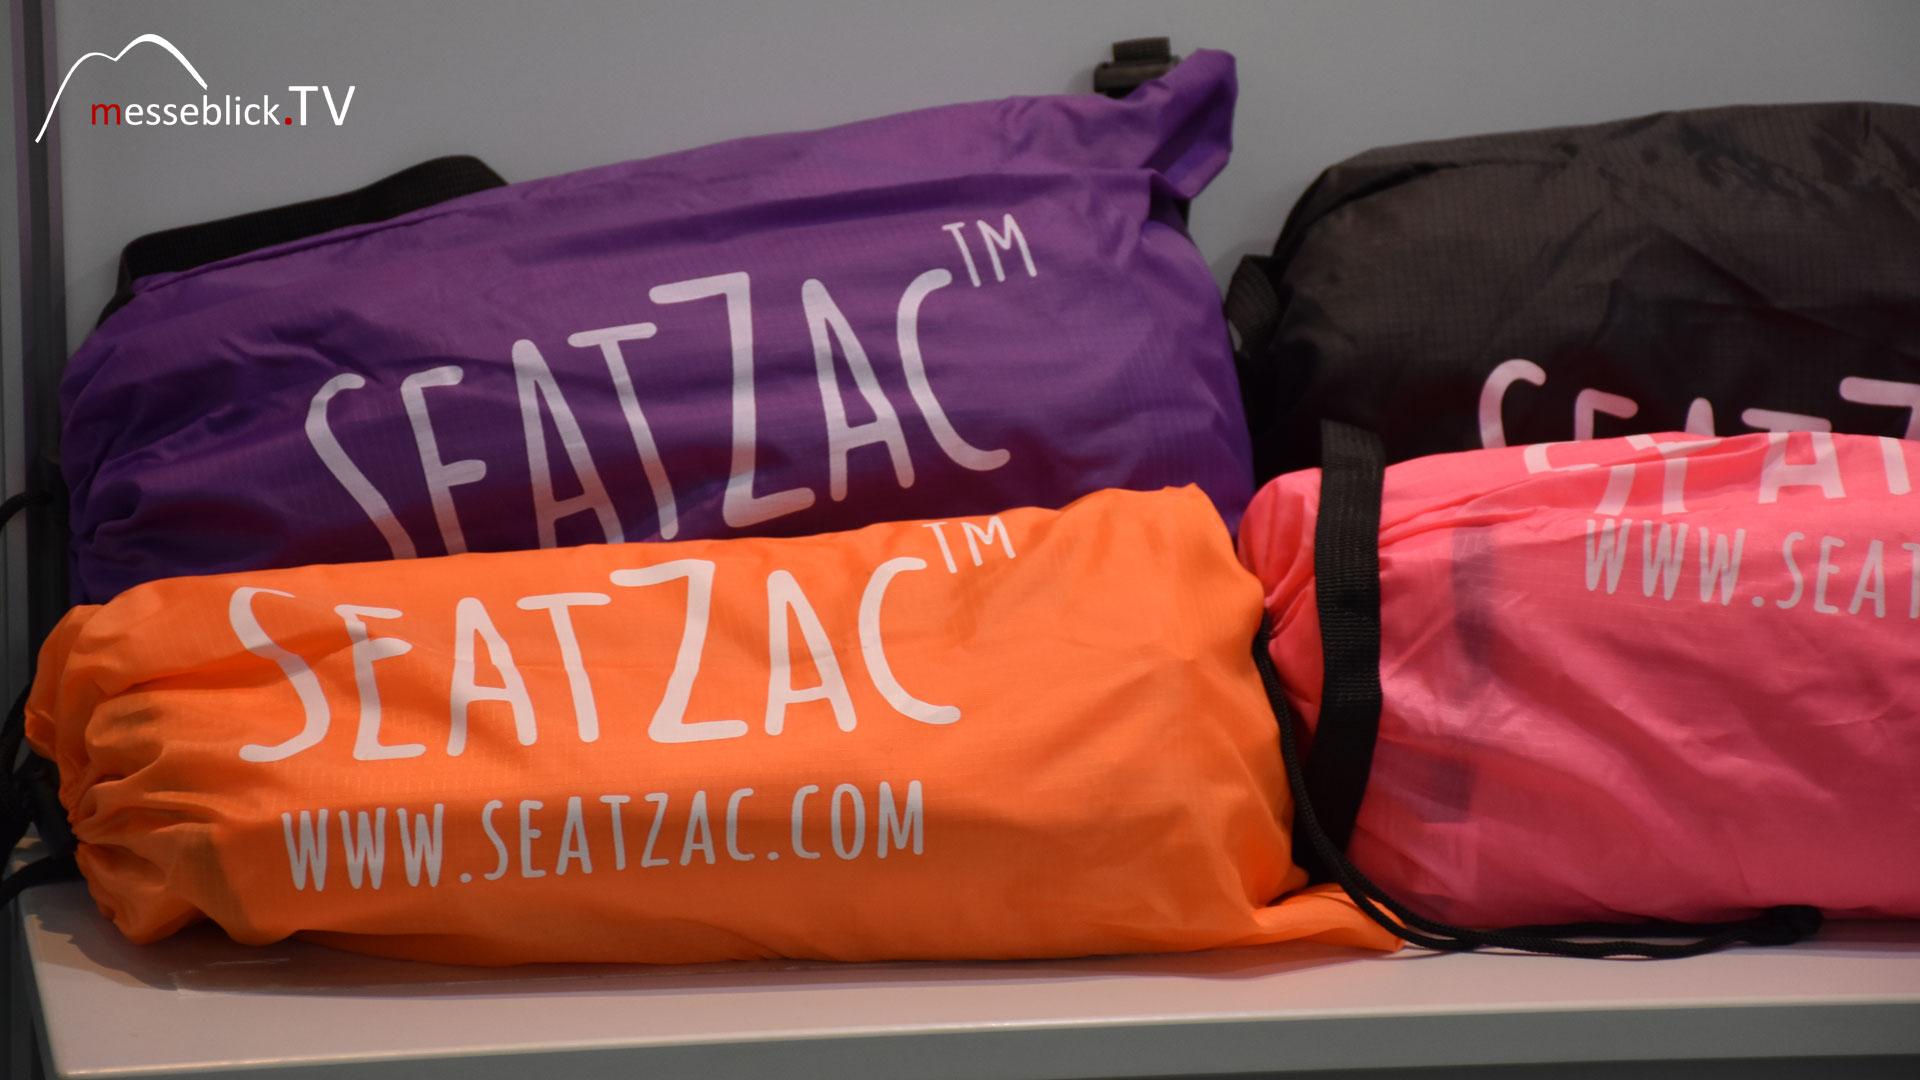 Chillbag Seatzac verpackt